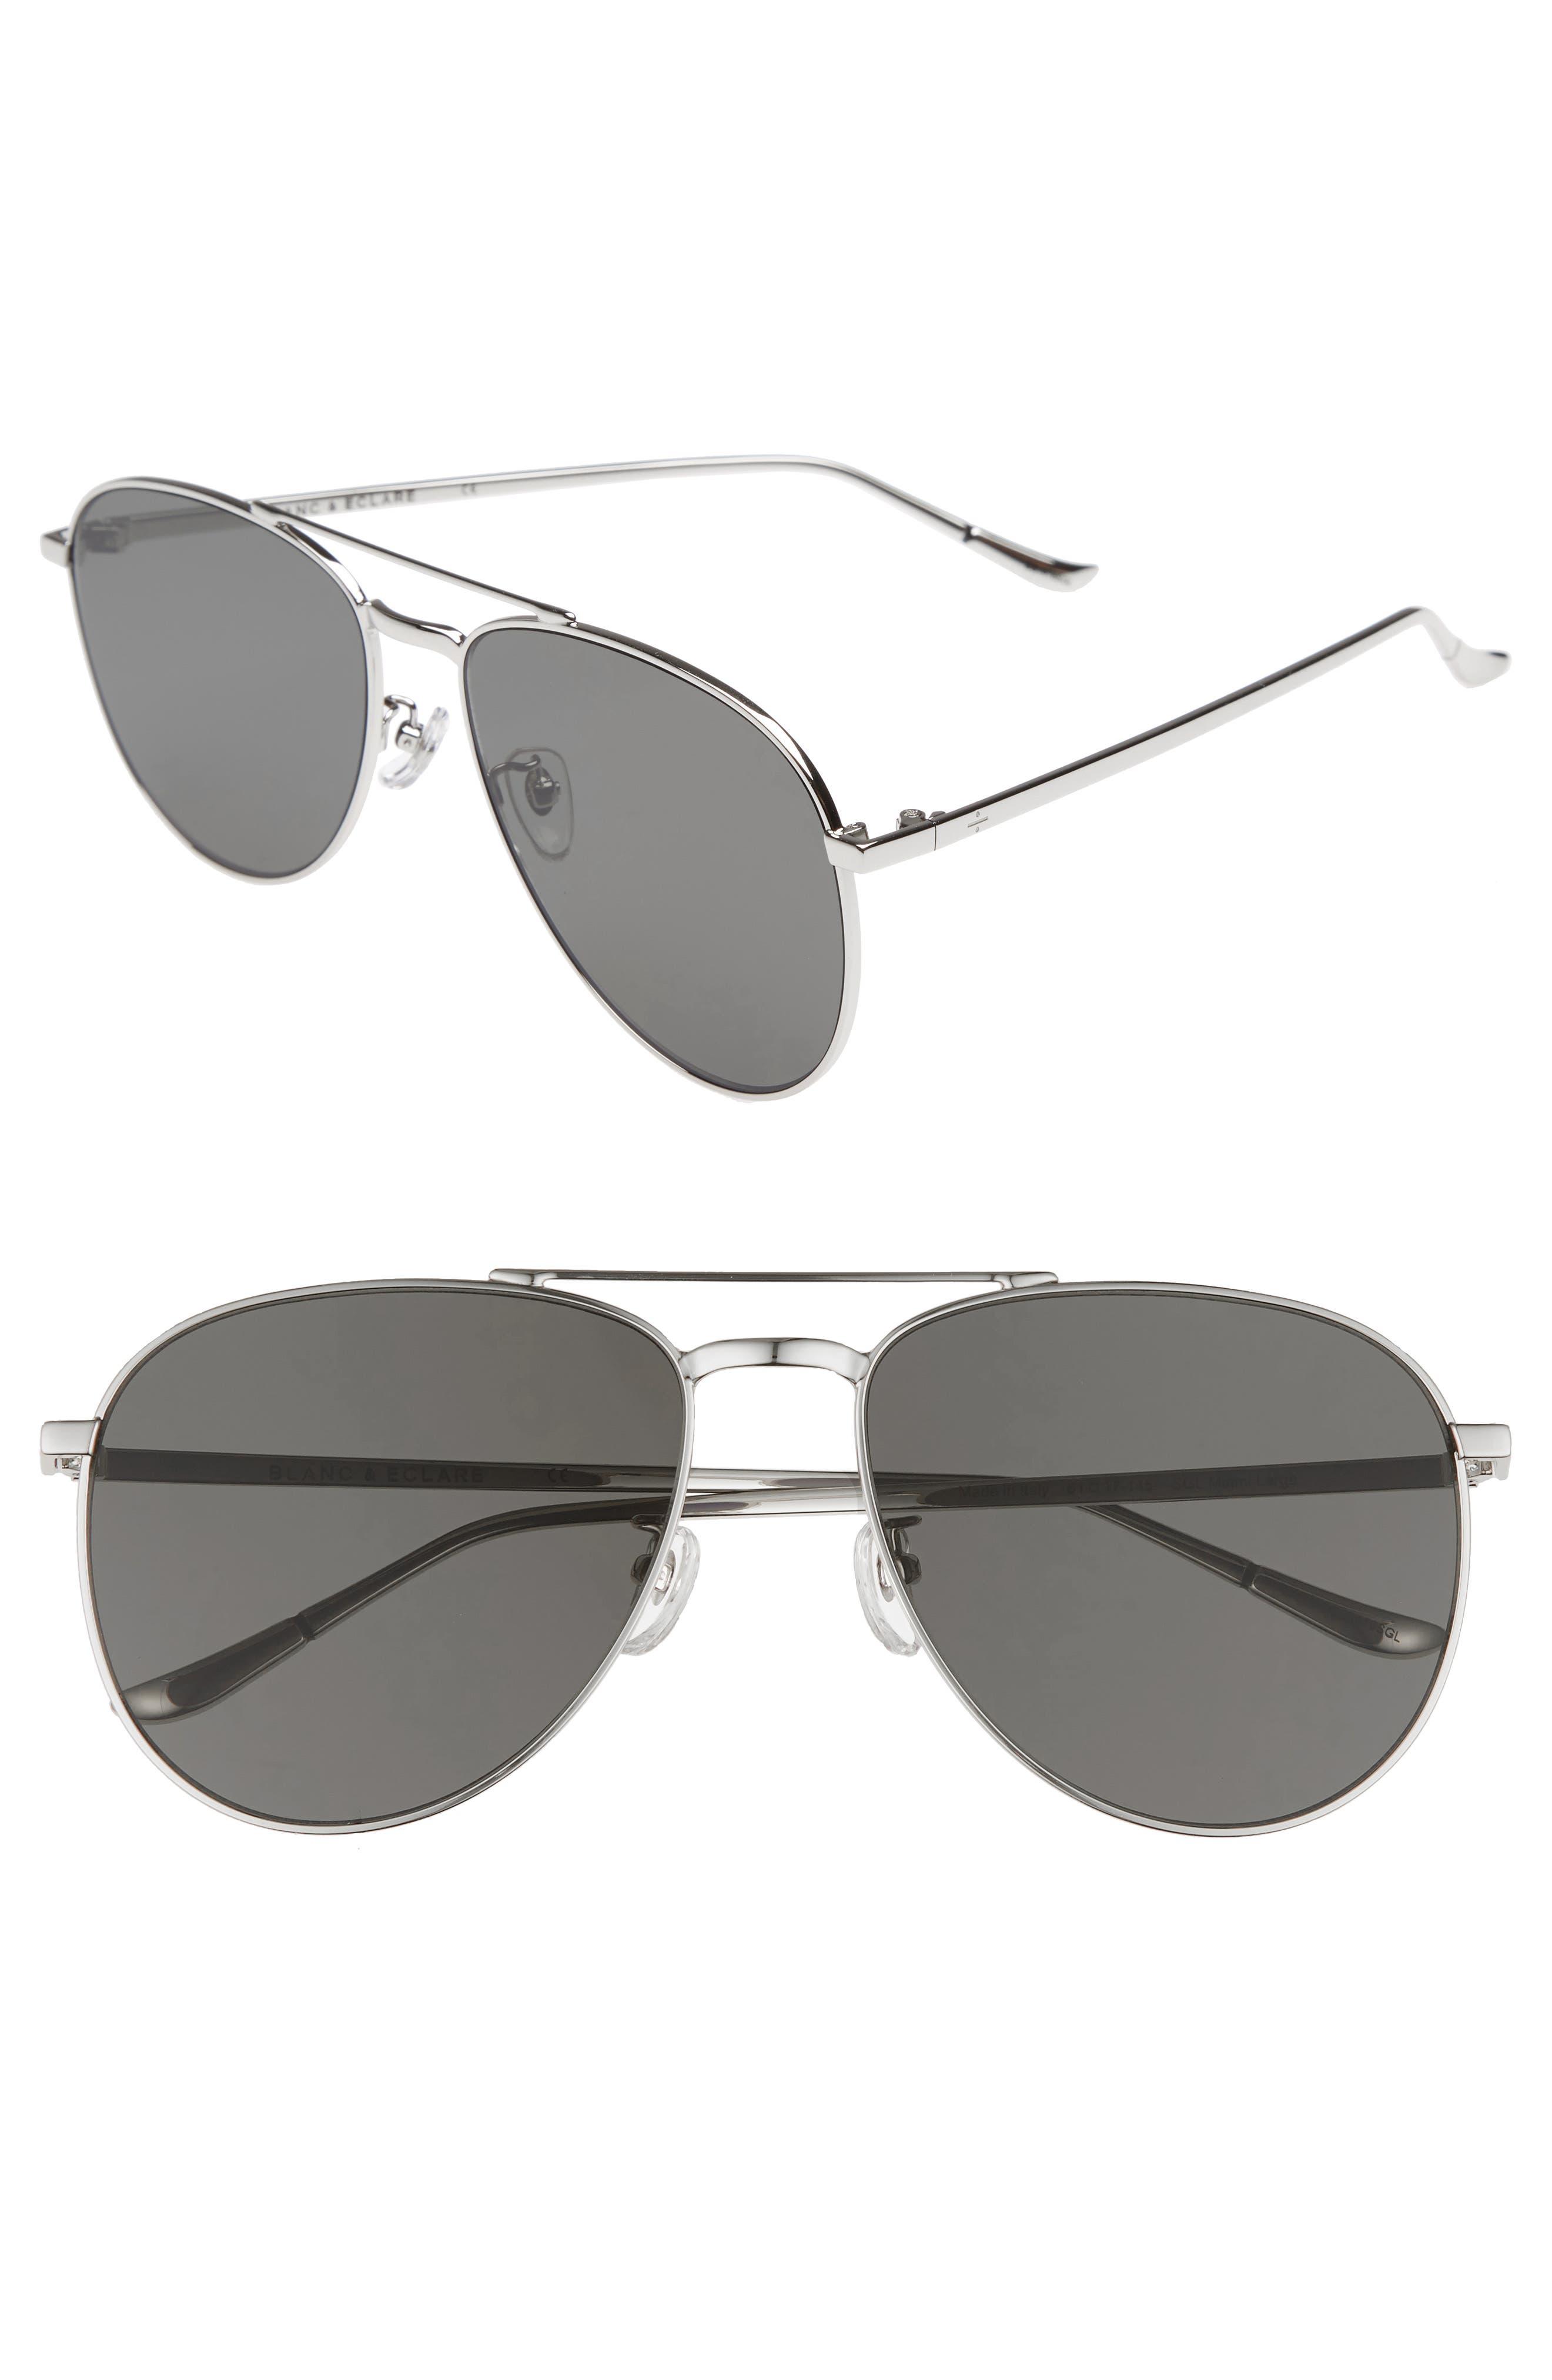 BLANC & ECLARE Miami 61mm Large Polarized Aviator Sunglasses,                         Main,                         color, 040